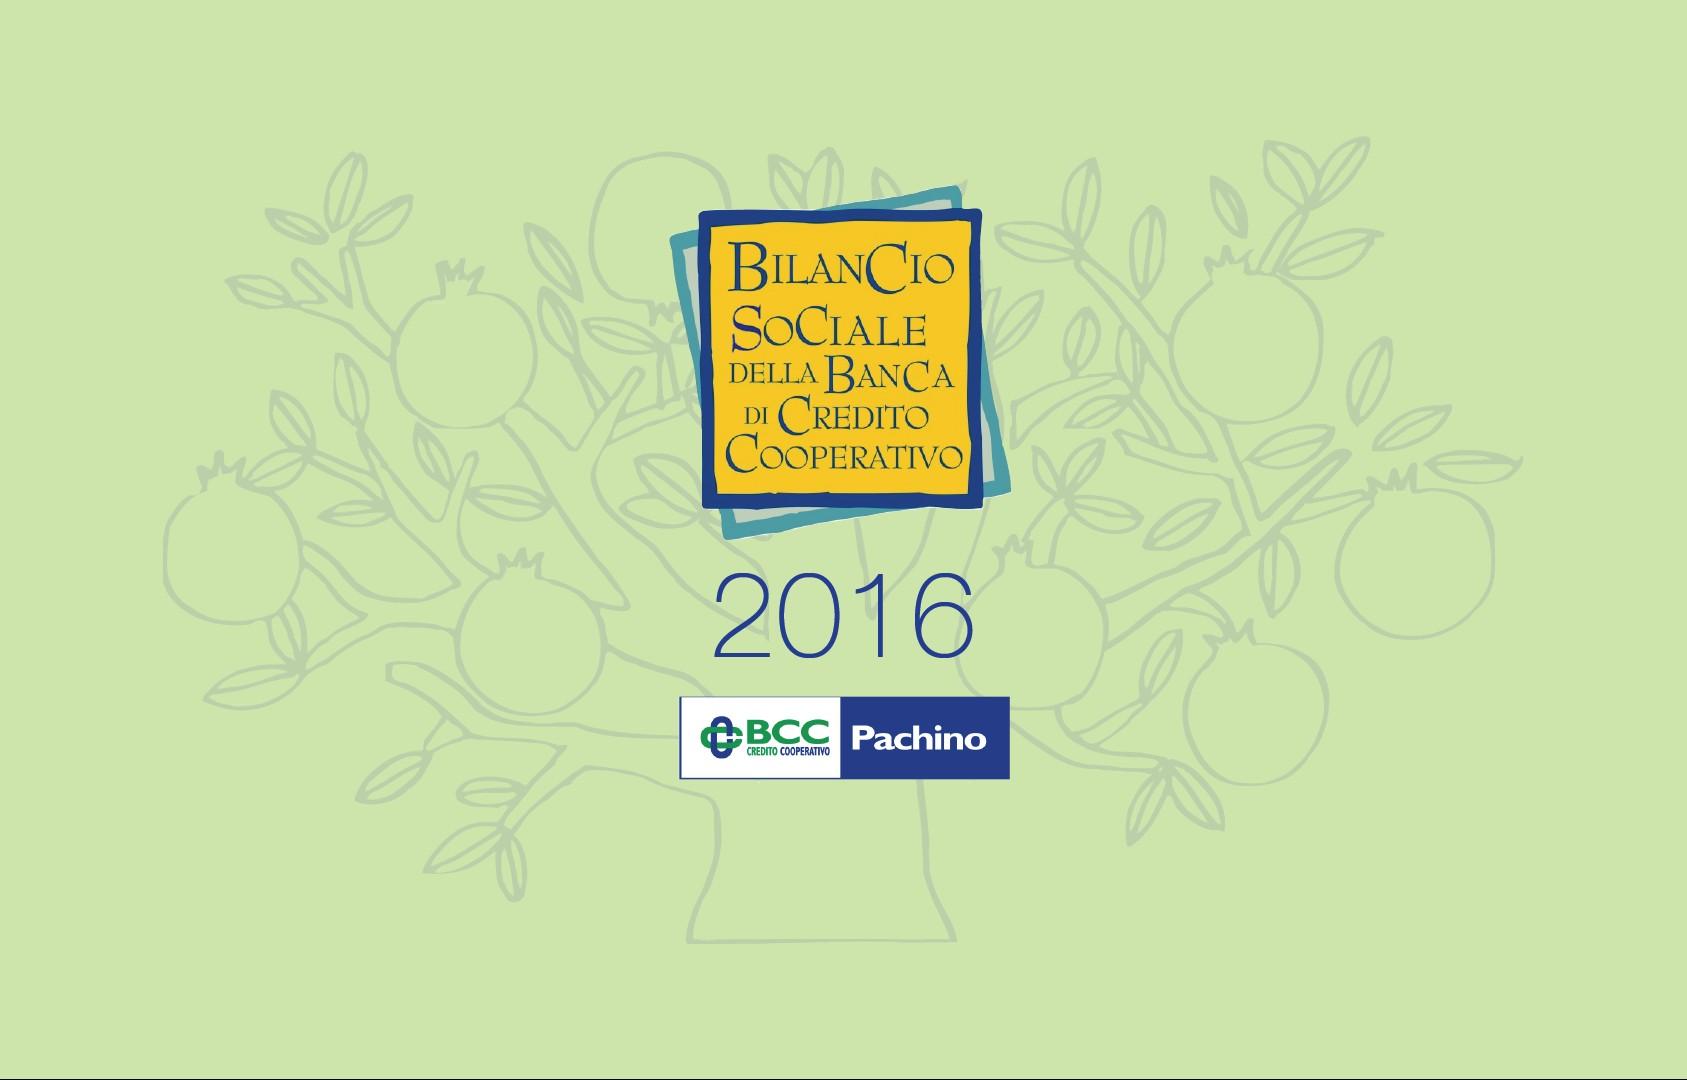 Bilancio Sociale 2016 - Copertina